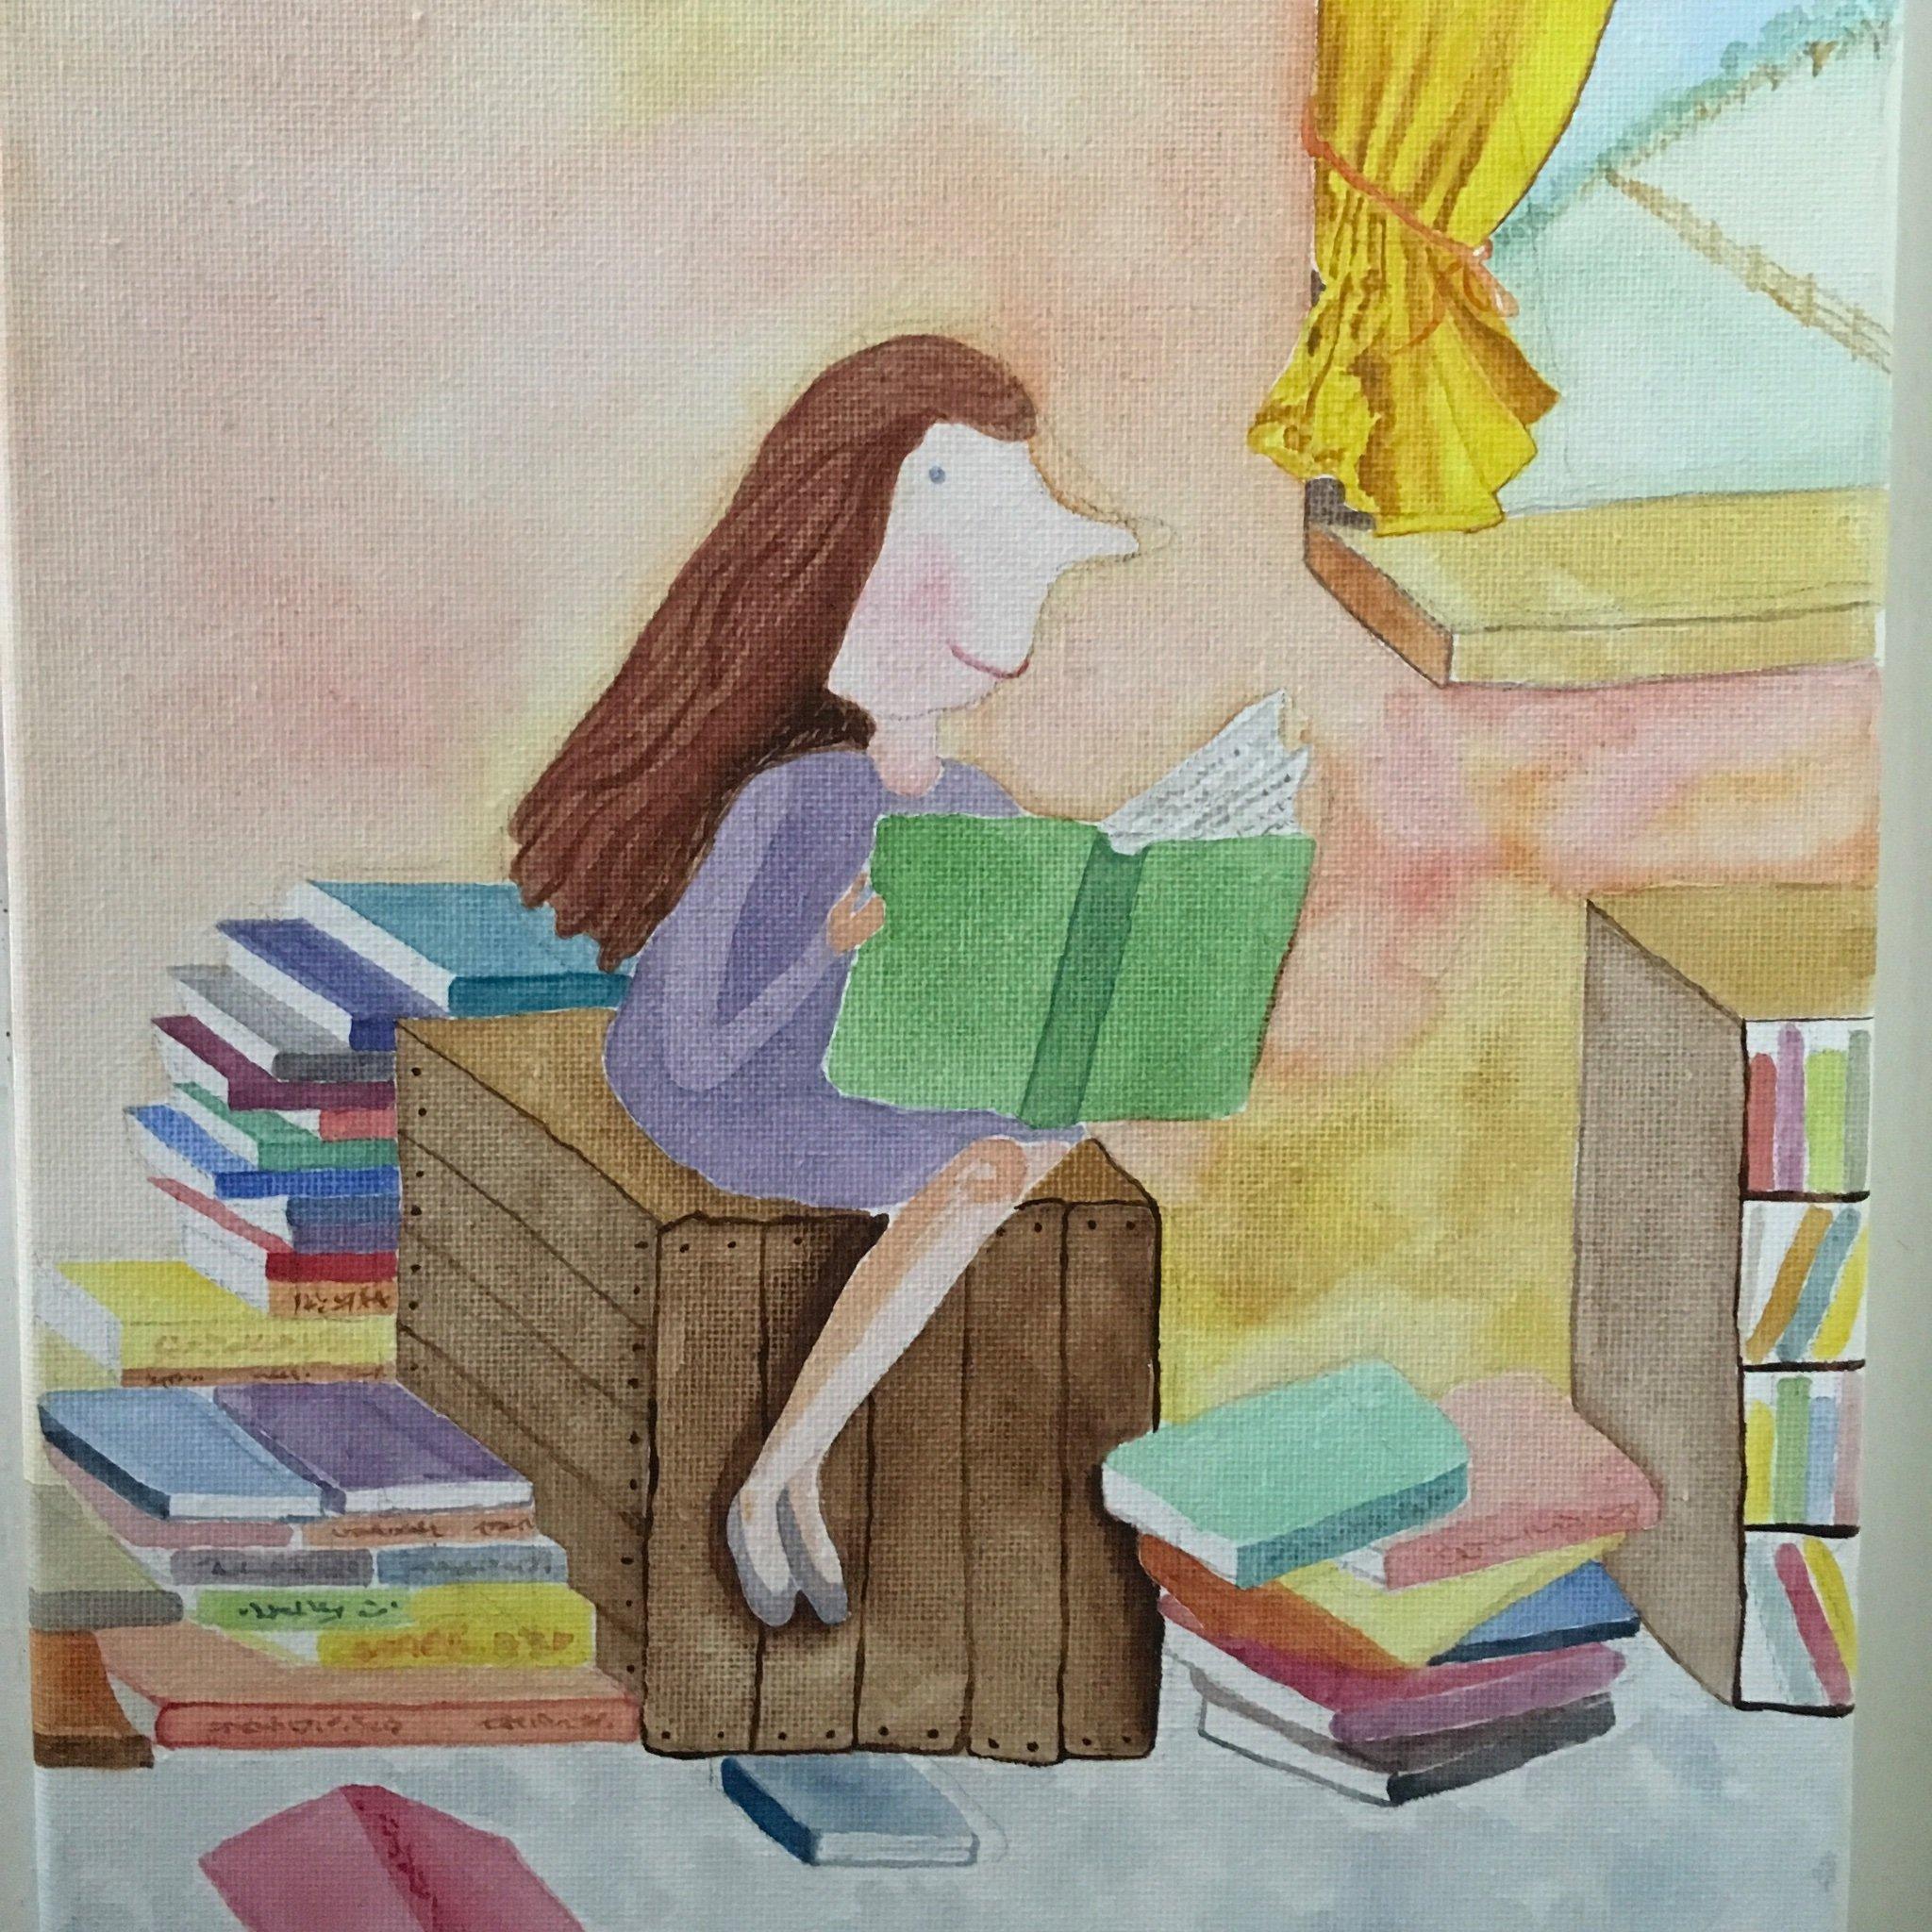 Tailored Yarn Gillian Seale Author and Illustrator